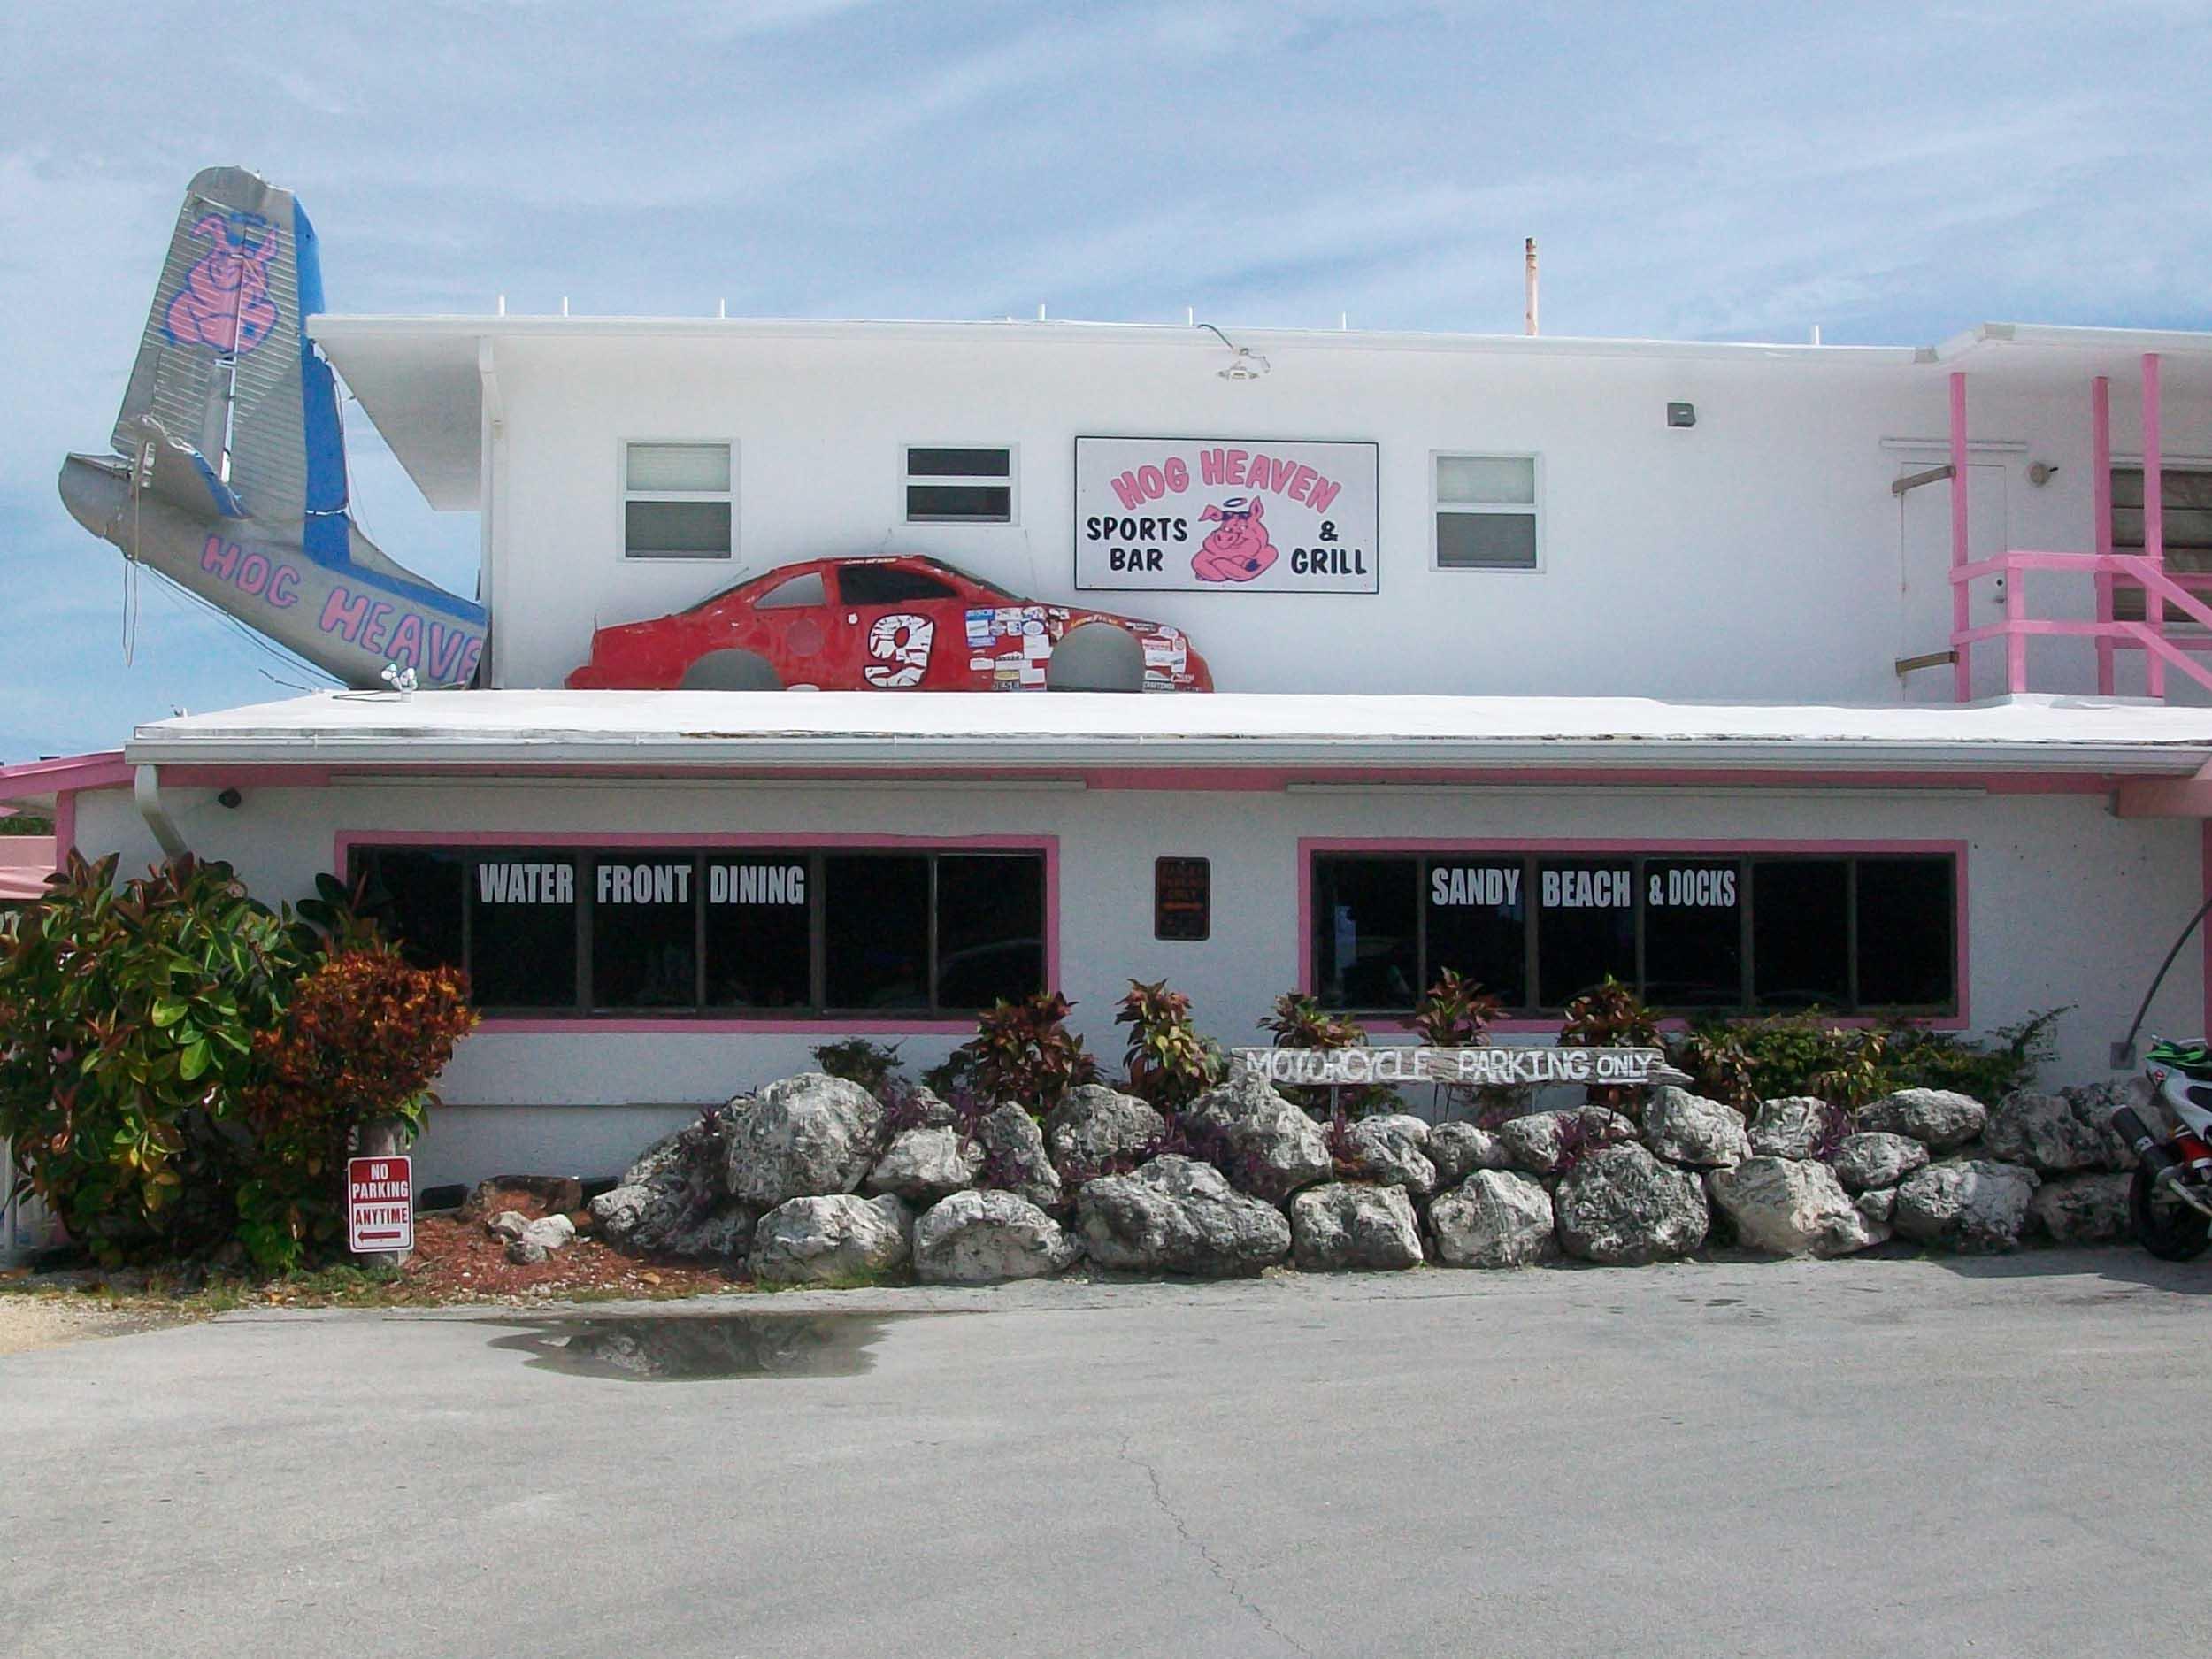 Hog Heaven Sports Bar and Grill Entrance